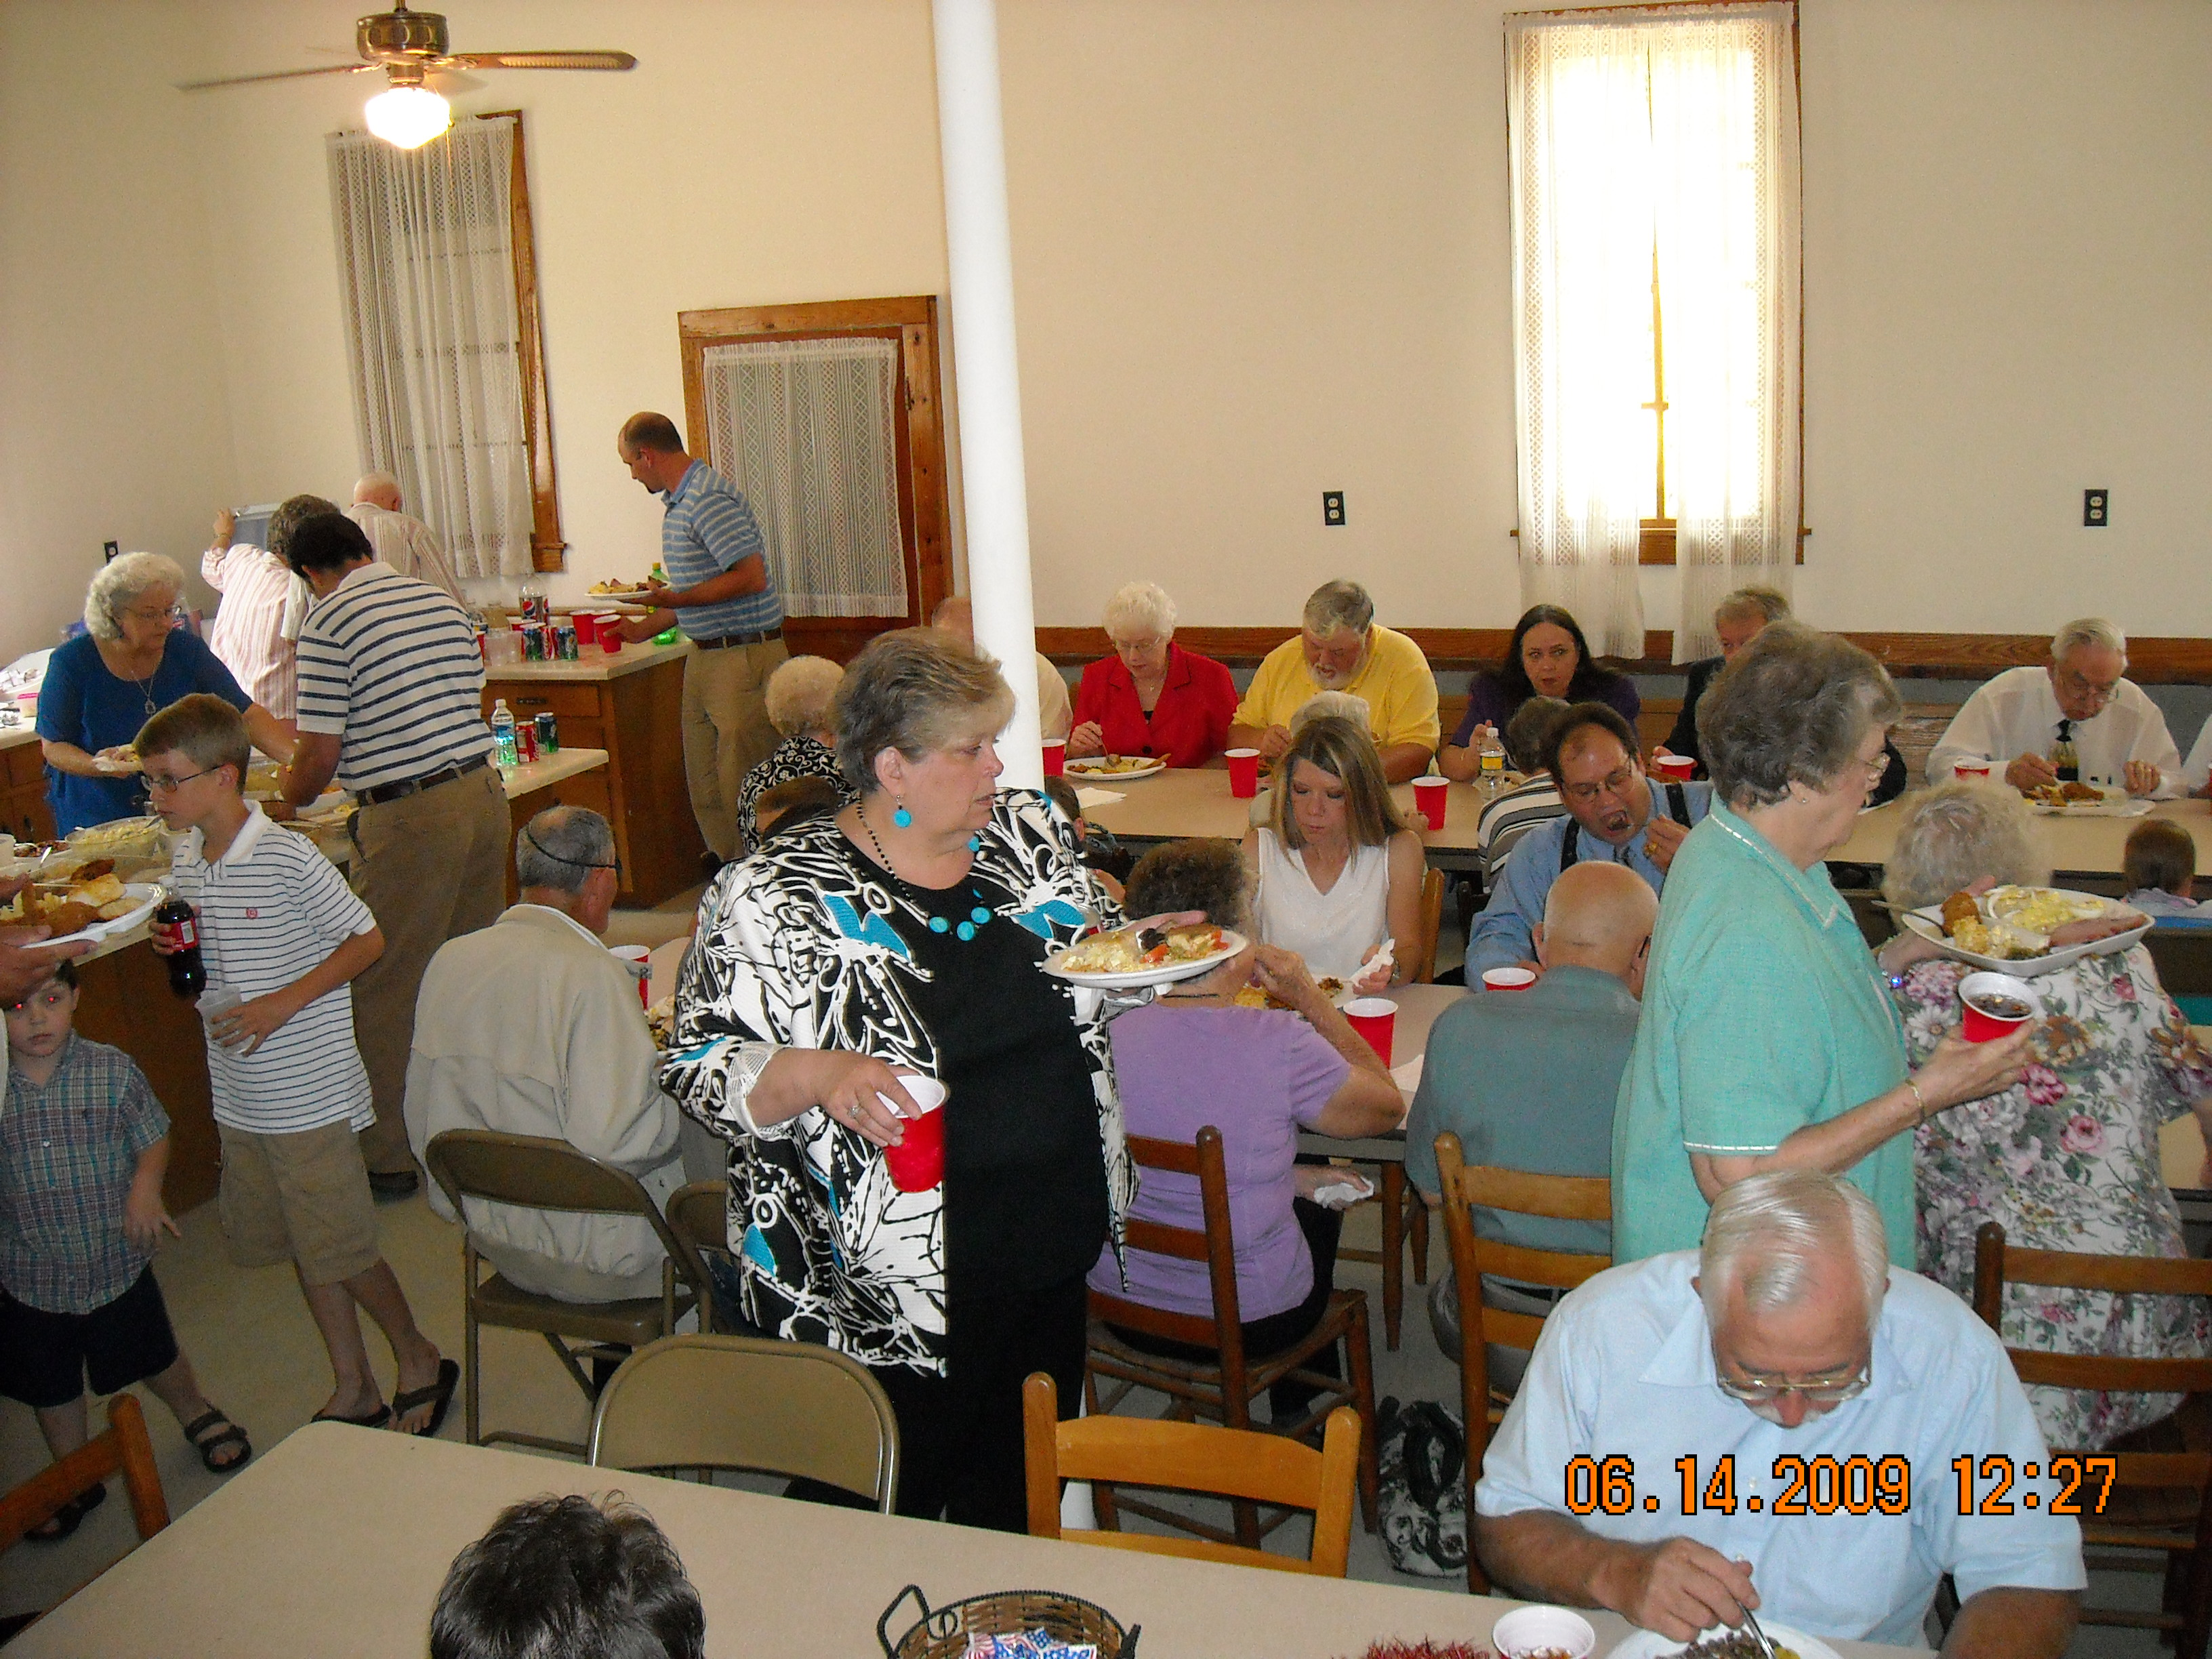 Stinchcomb Homecoming, June 14, 2009.jpeg 009